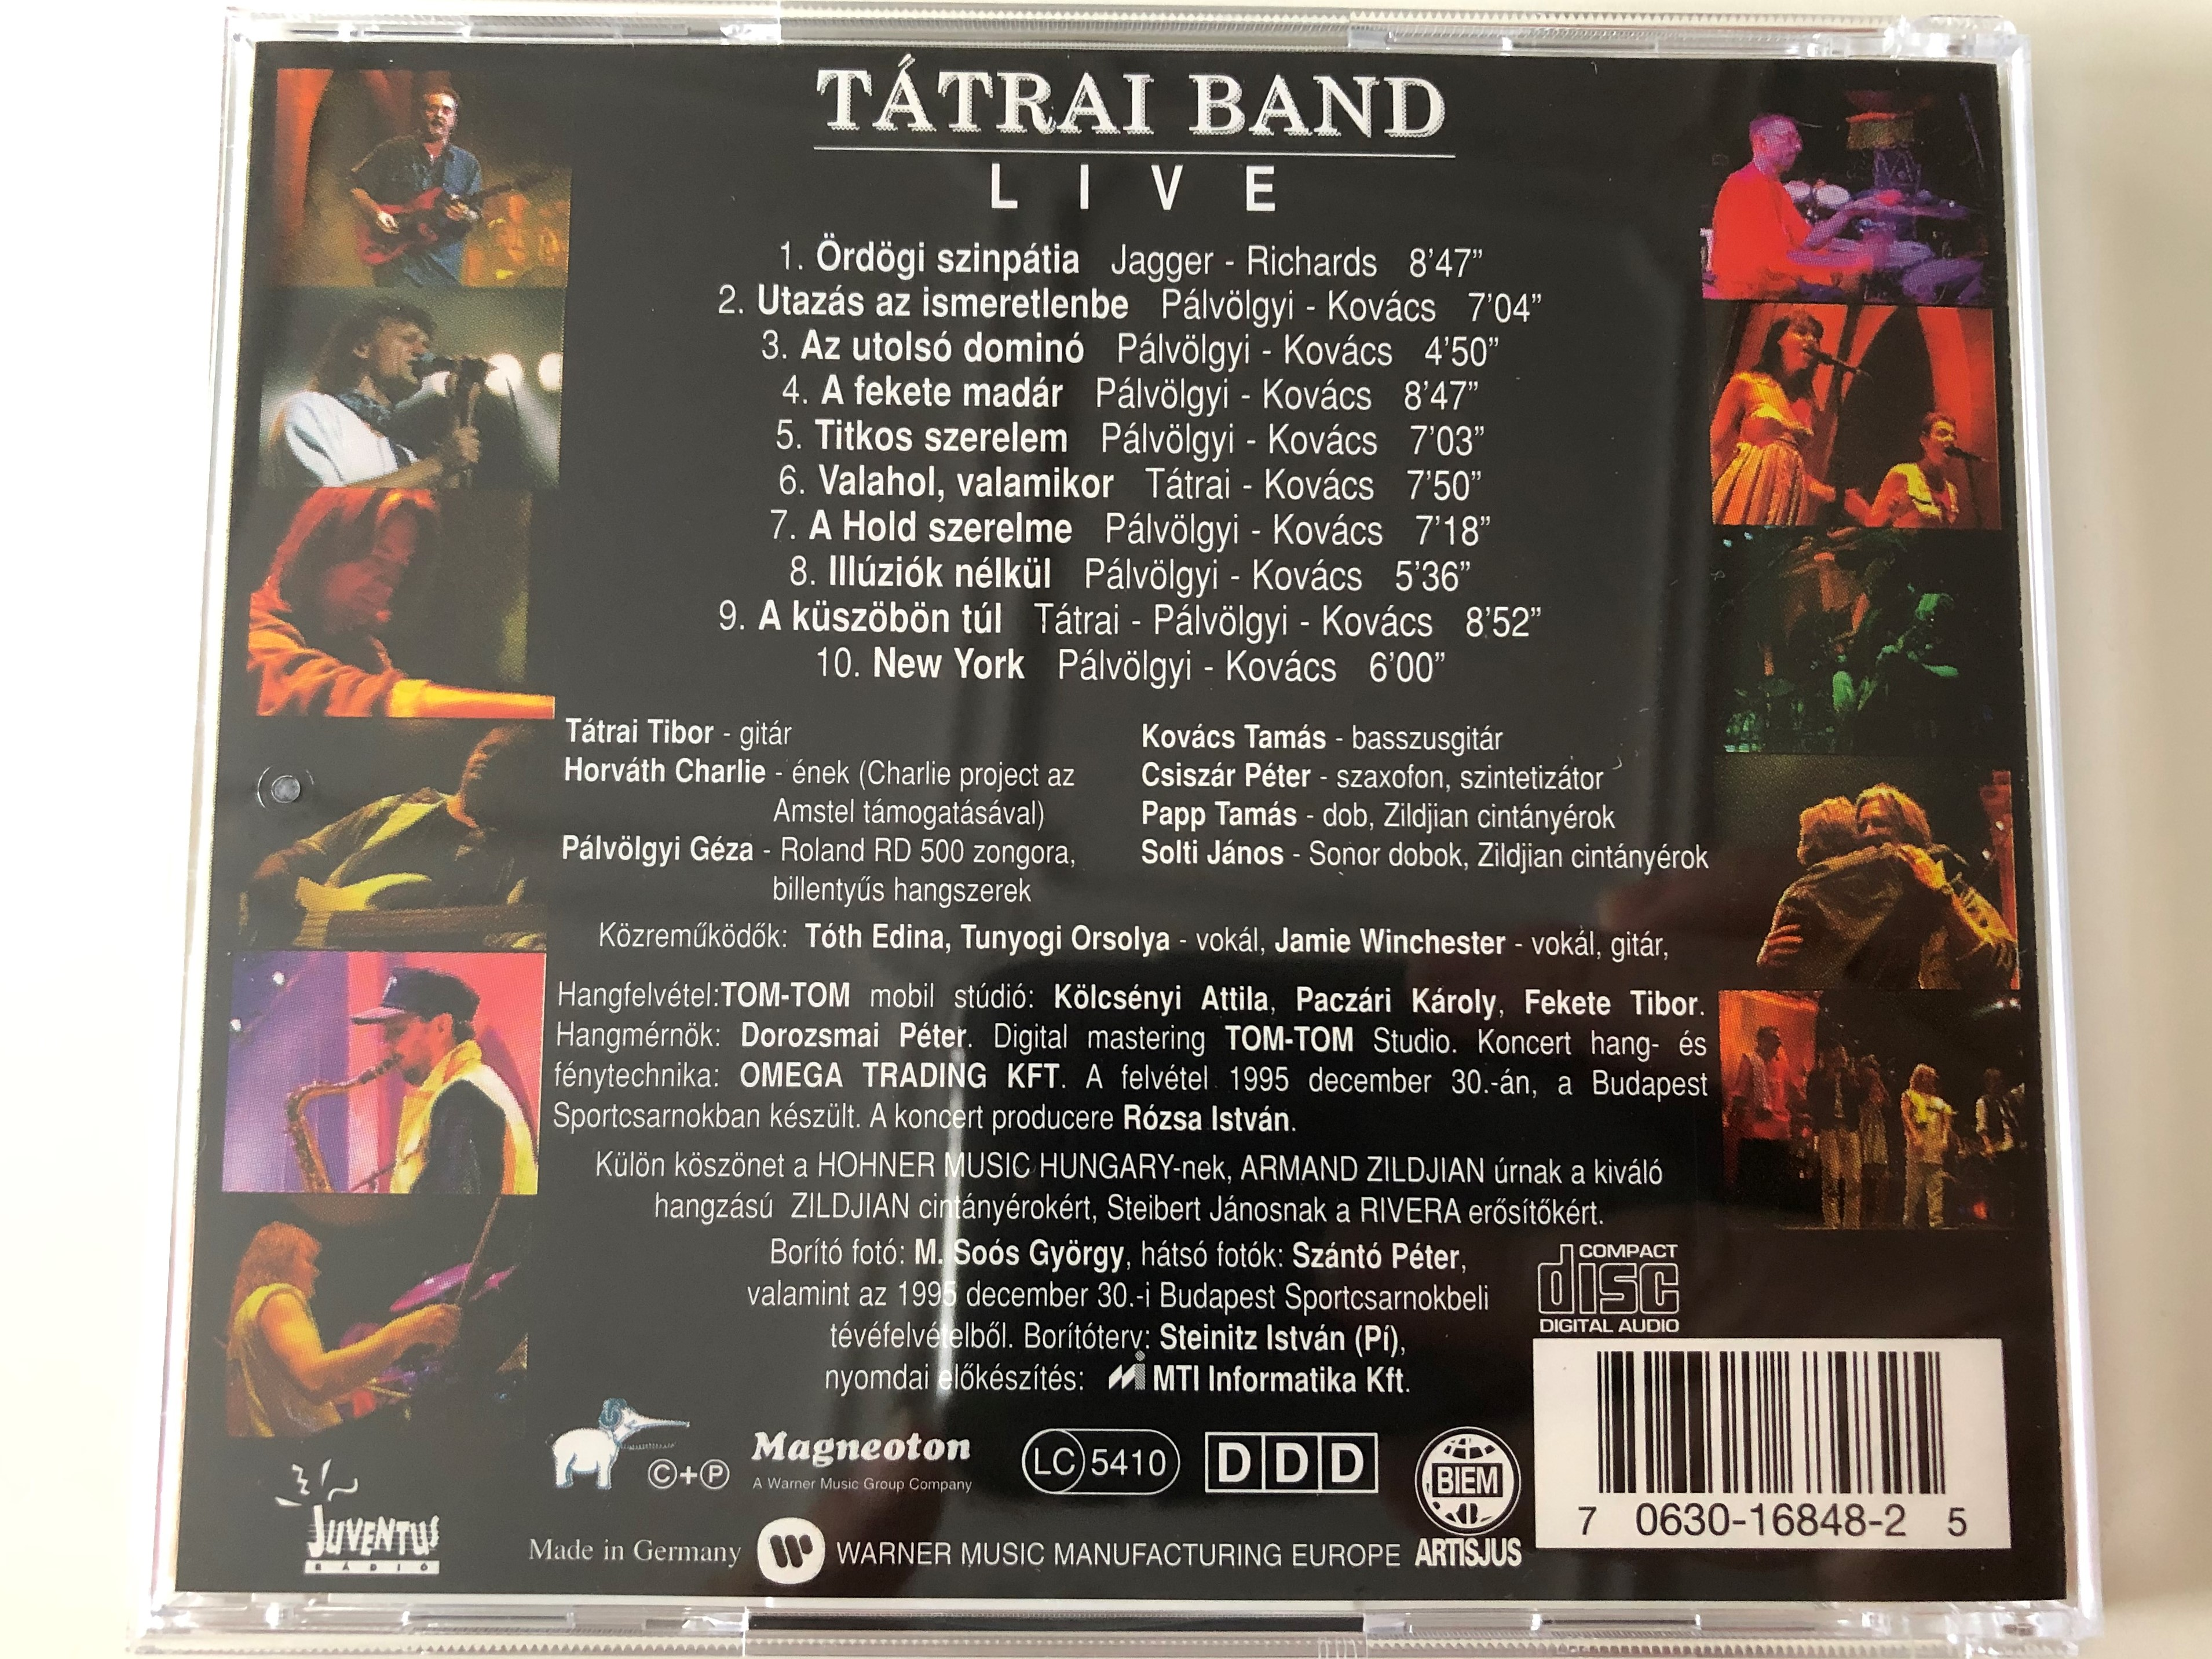 t-trai-band-live-tril-gia-2-magneoton-audio-cd-0630-16848-2-4-.jpg